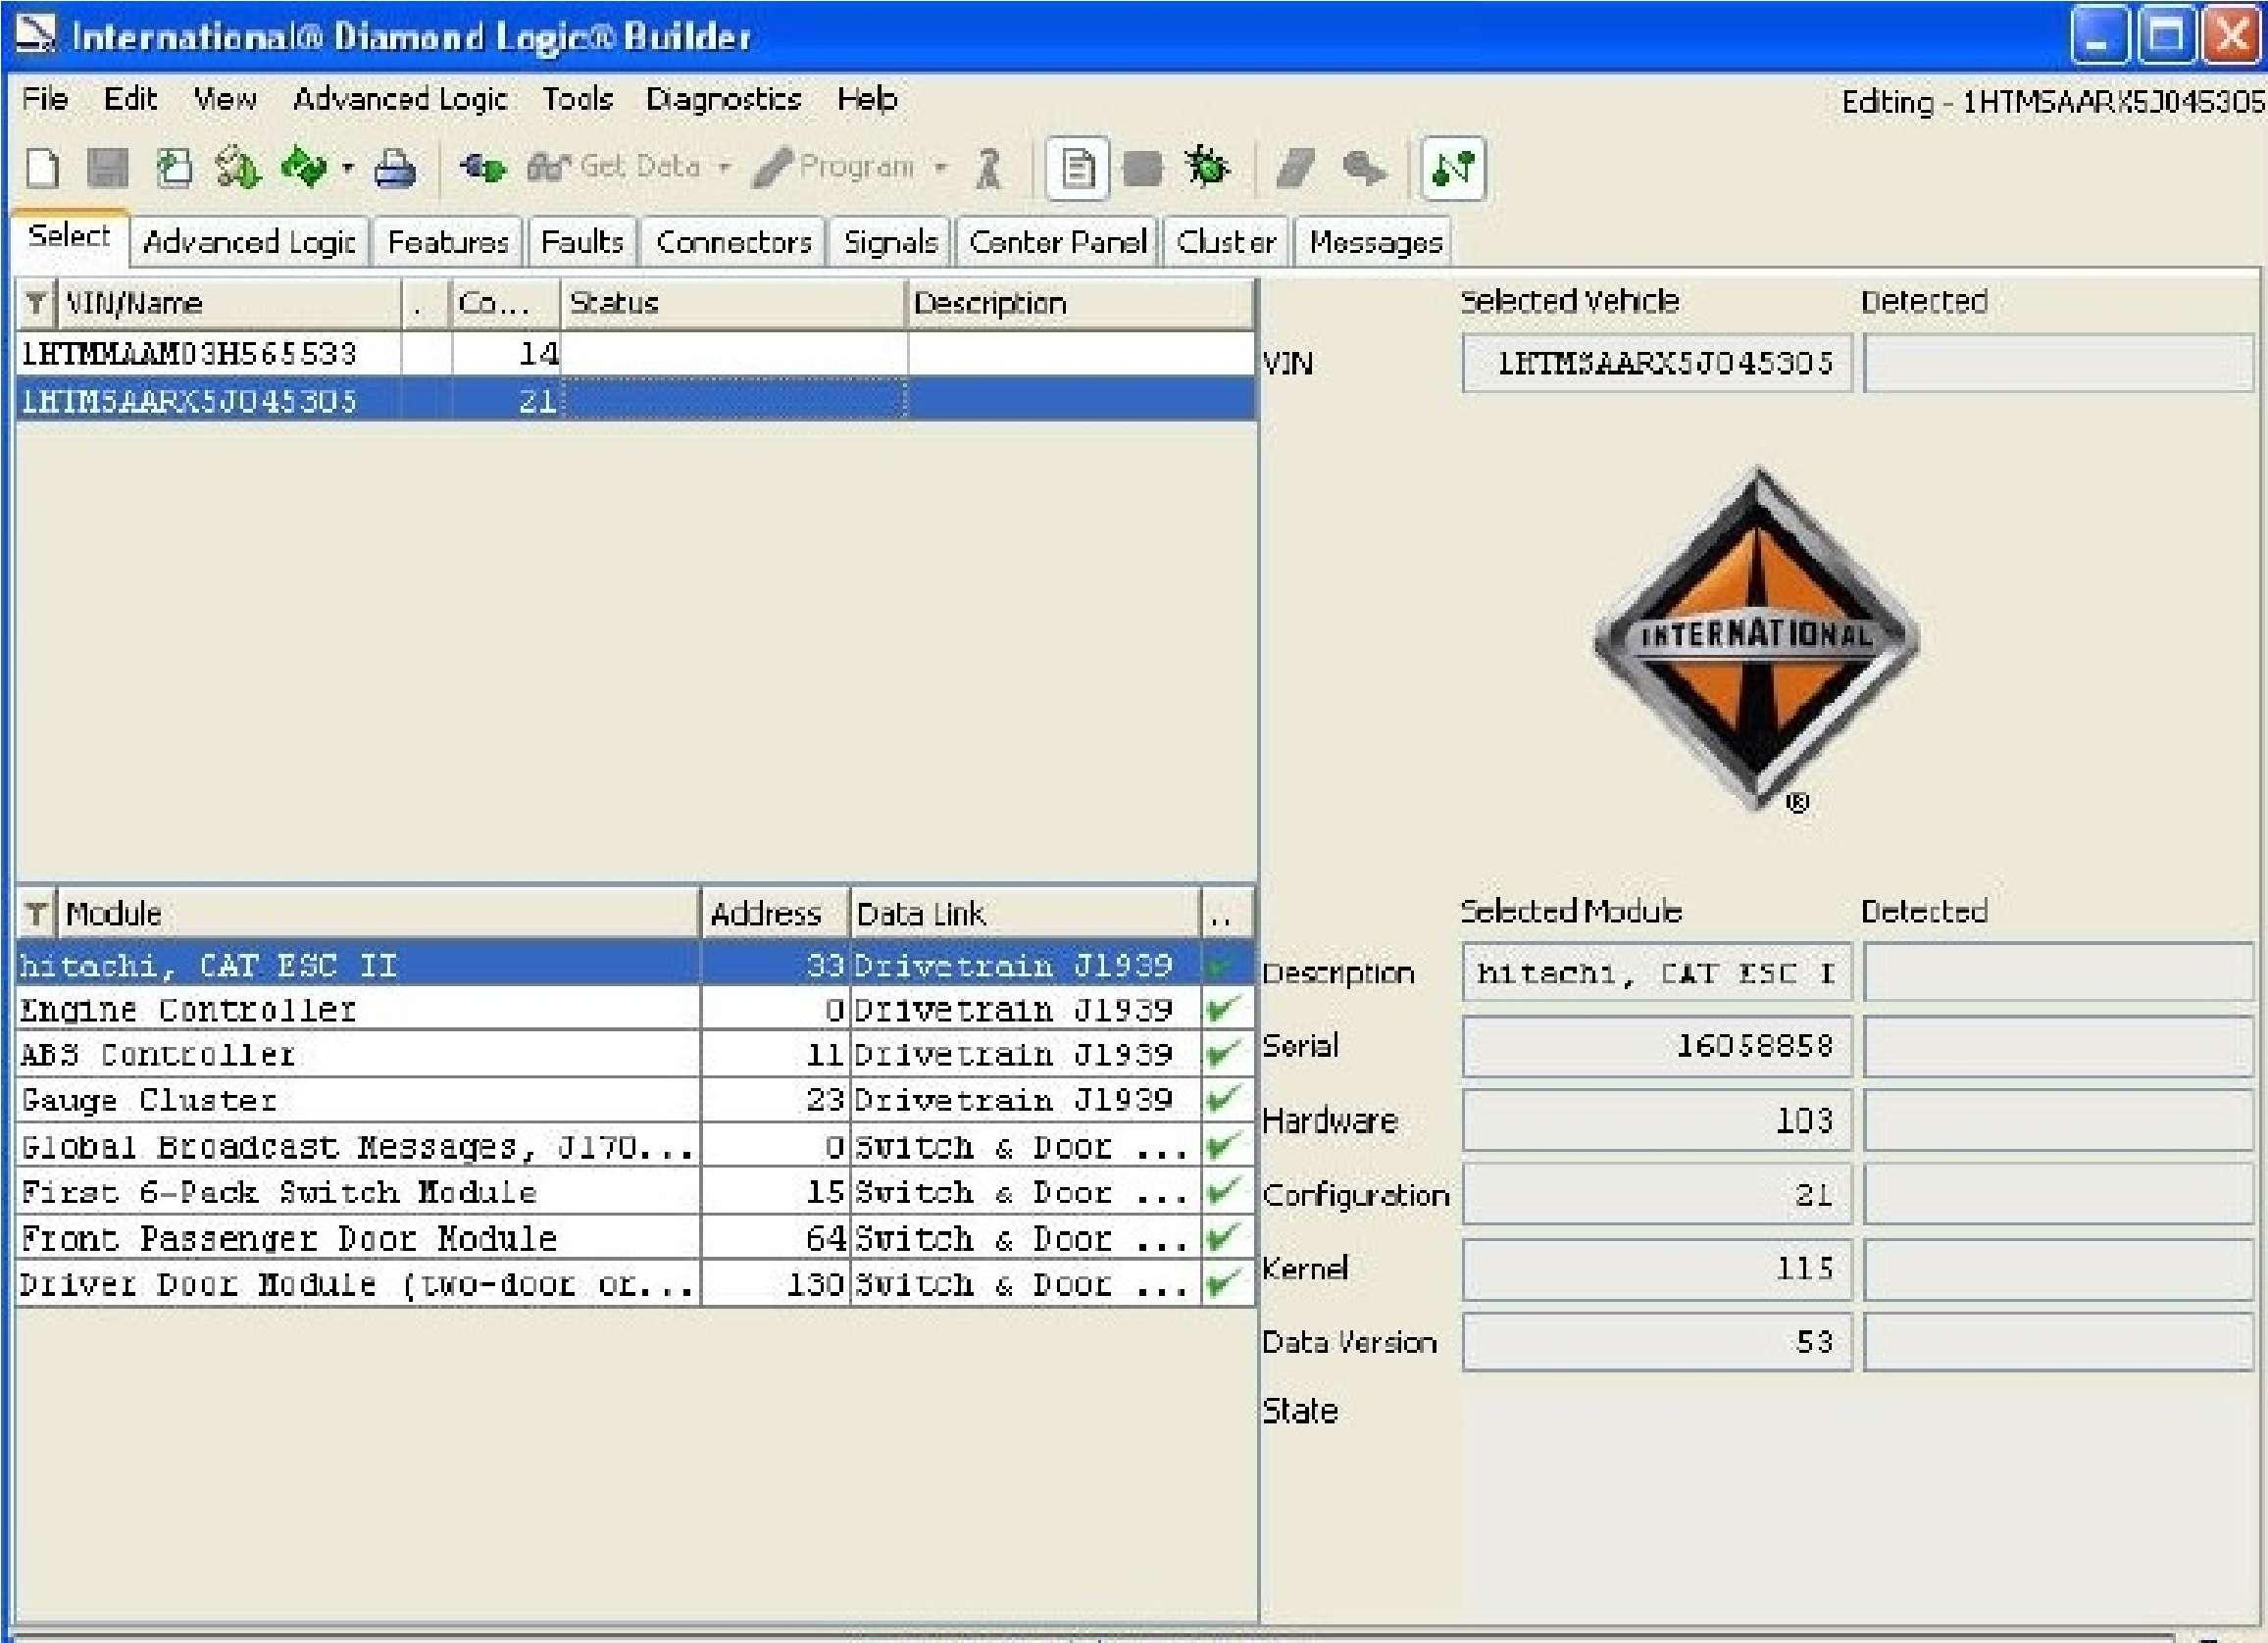 Navistar Diamond Logic Builder DLB 2020 SS-01